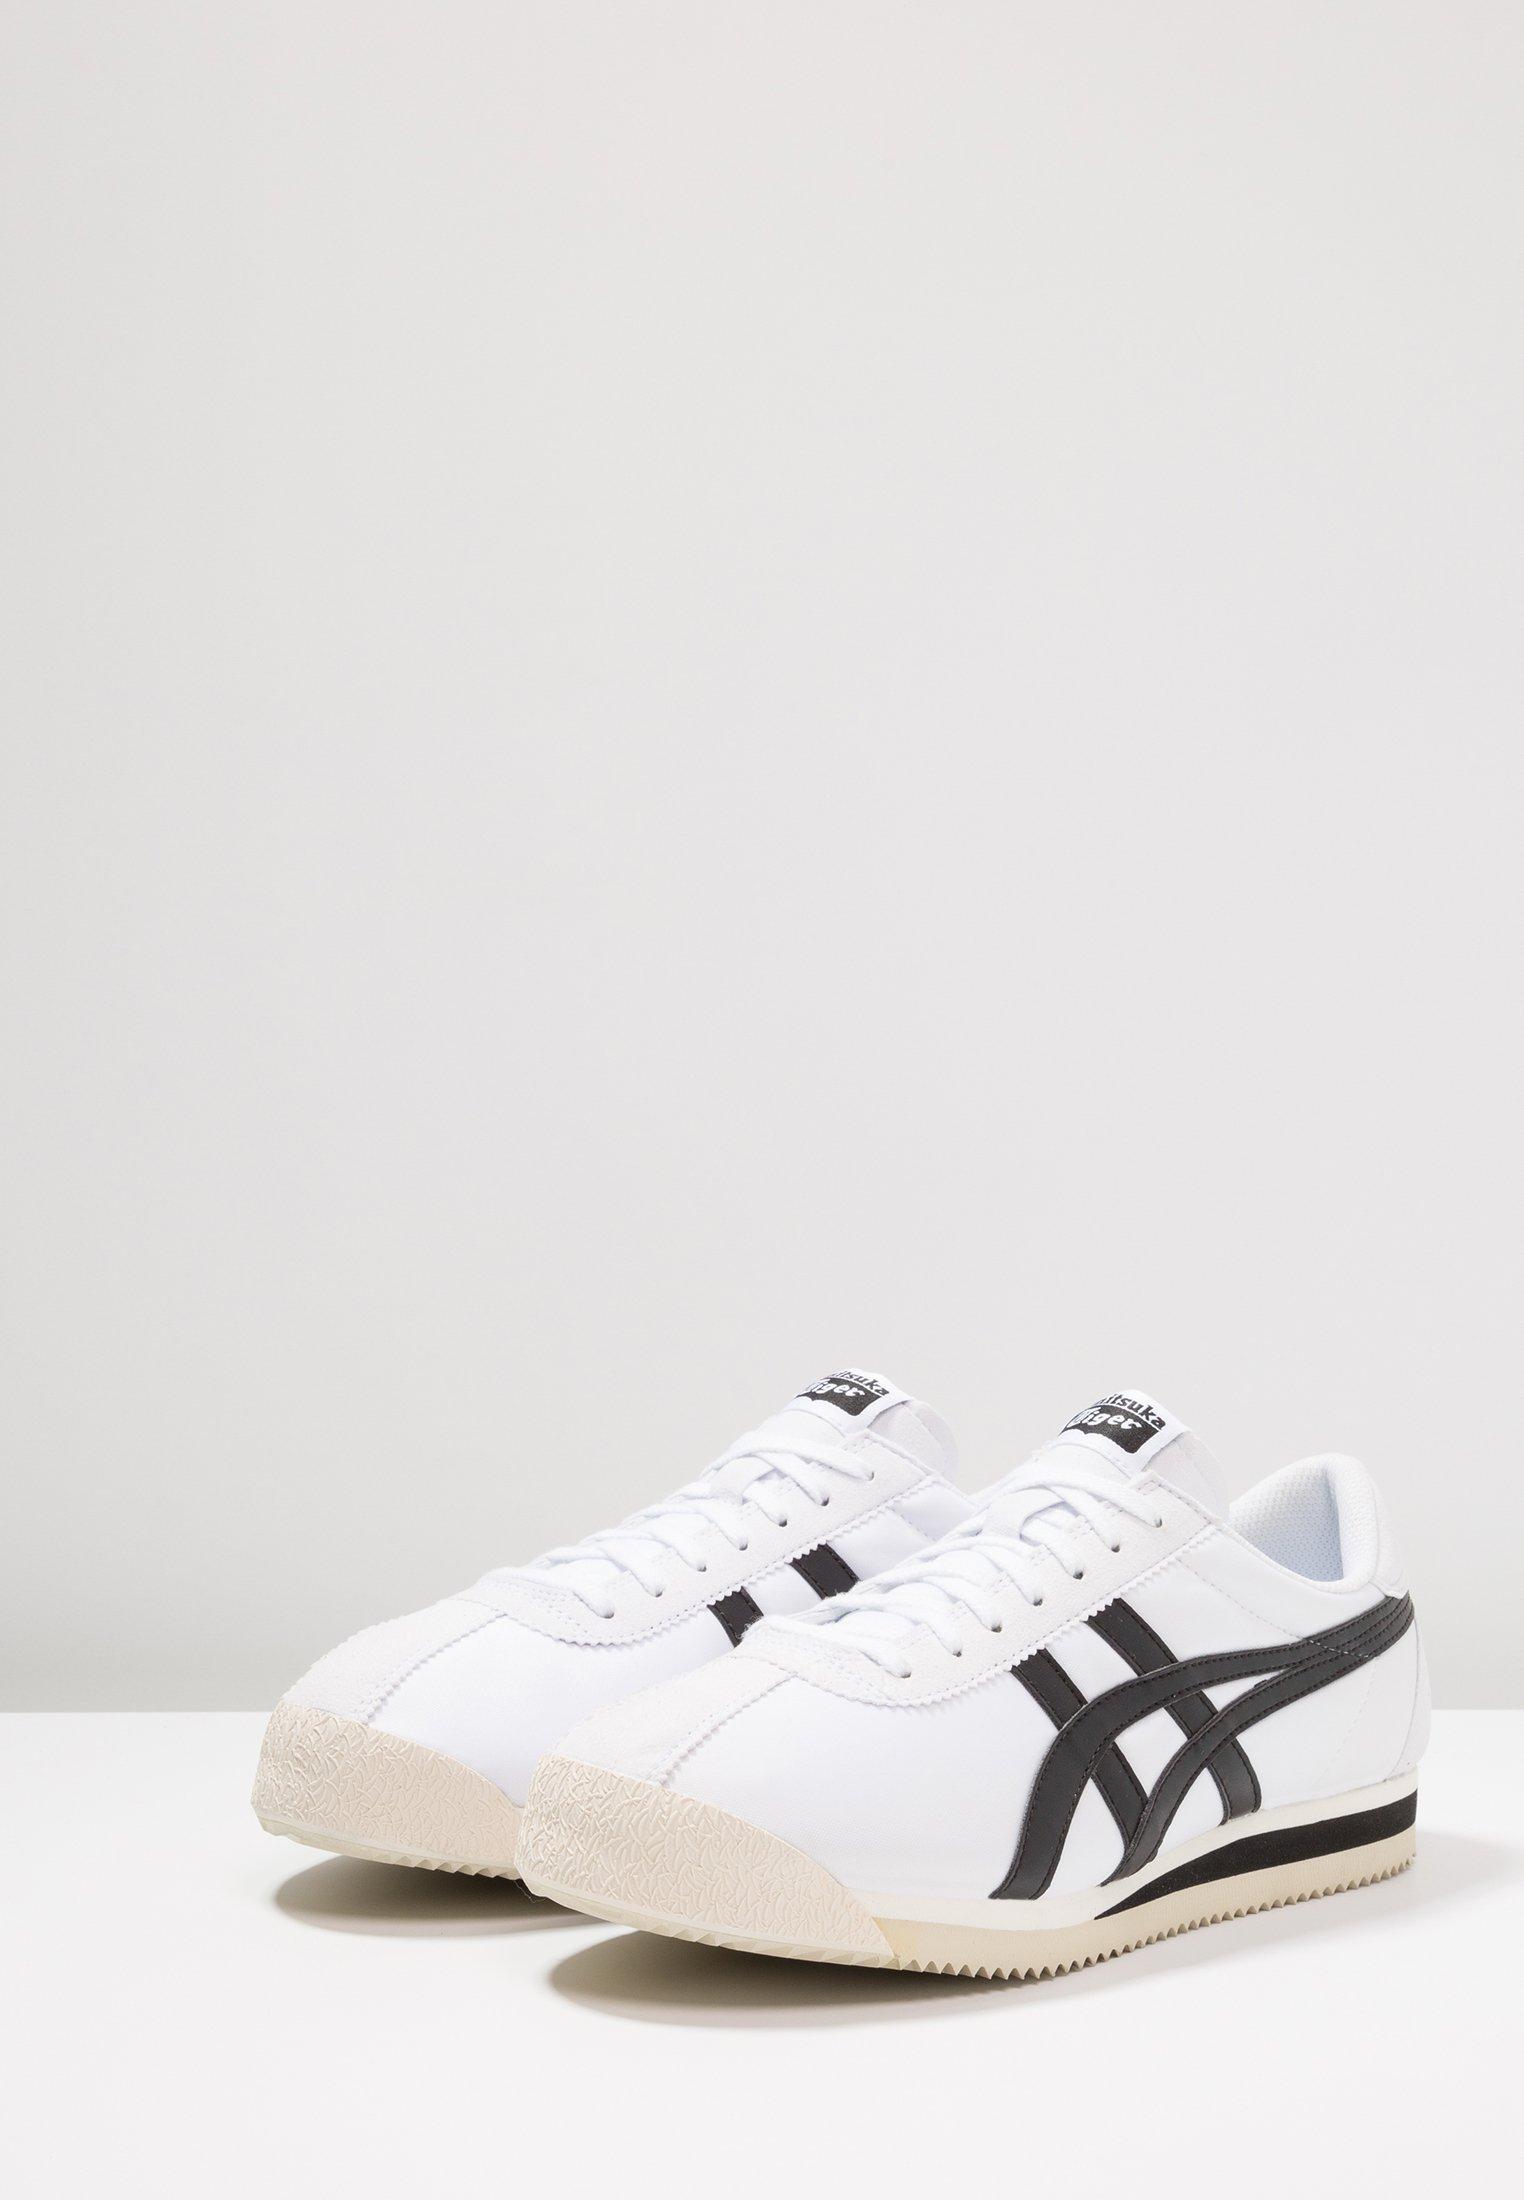 Onitsuka Tiger Corsair - Sneaker Low White/black Black Friday